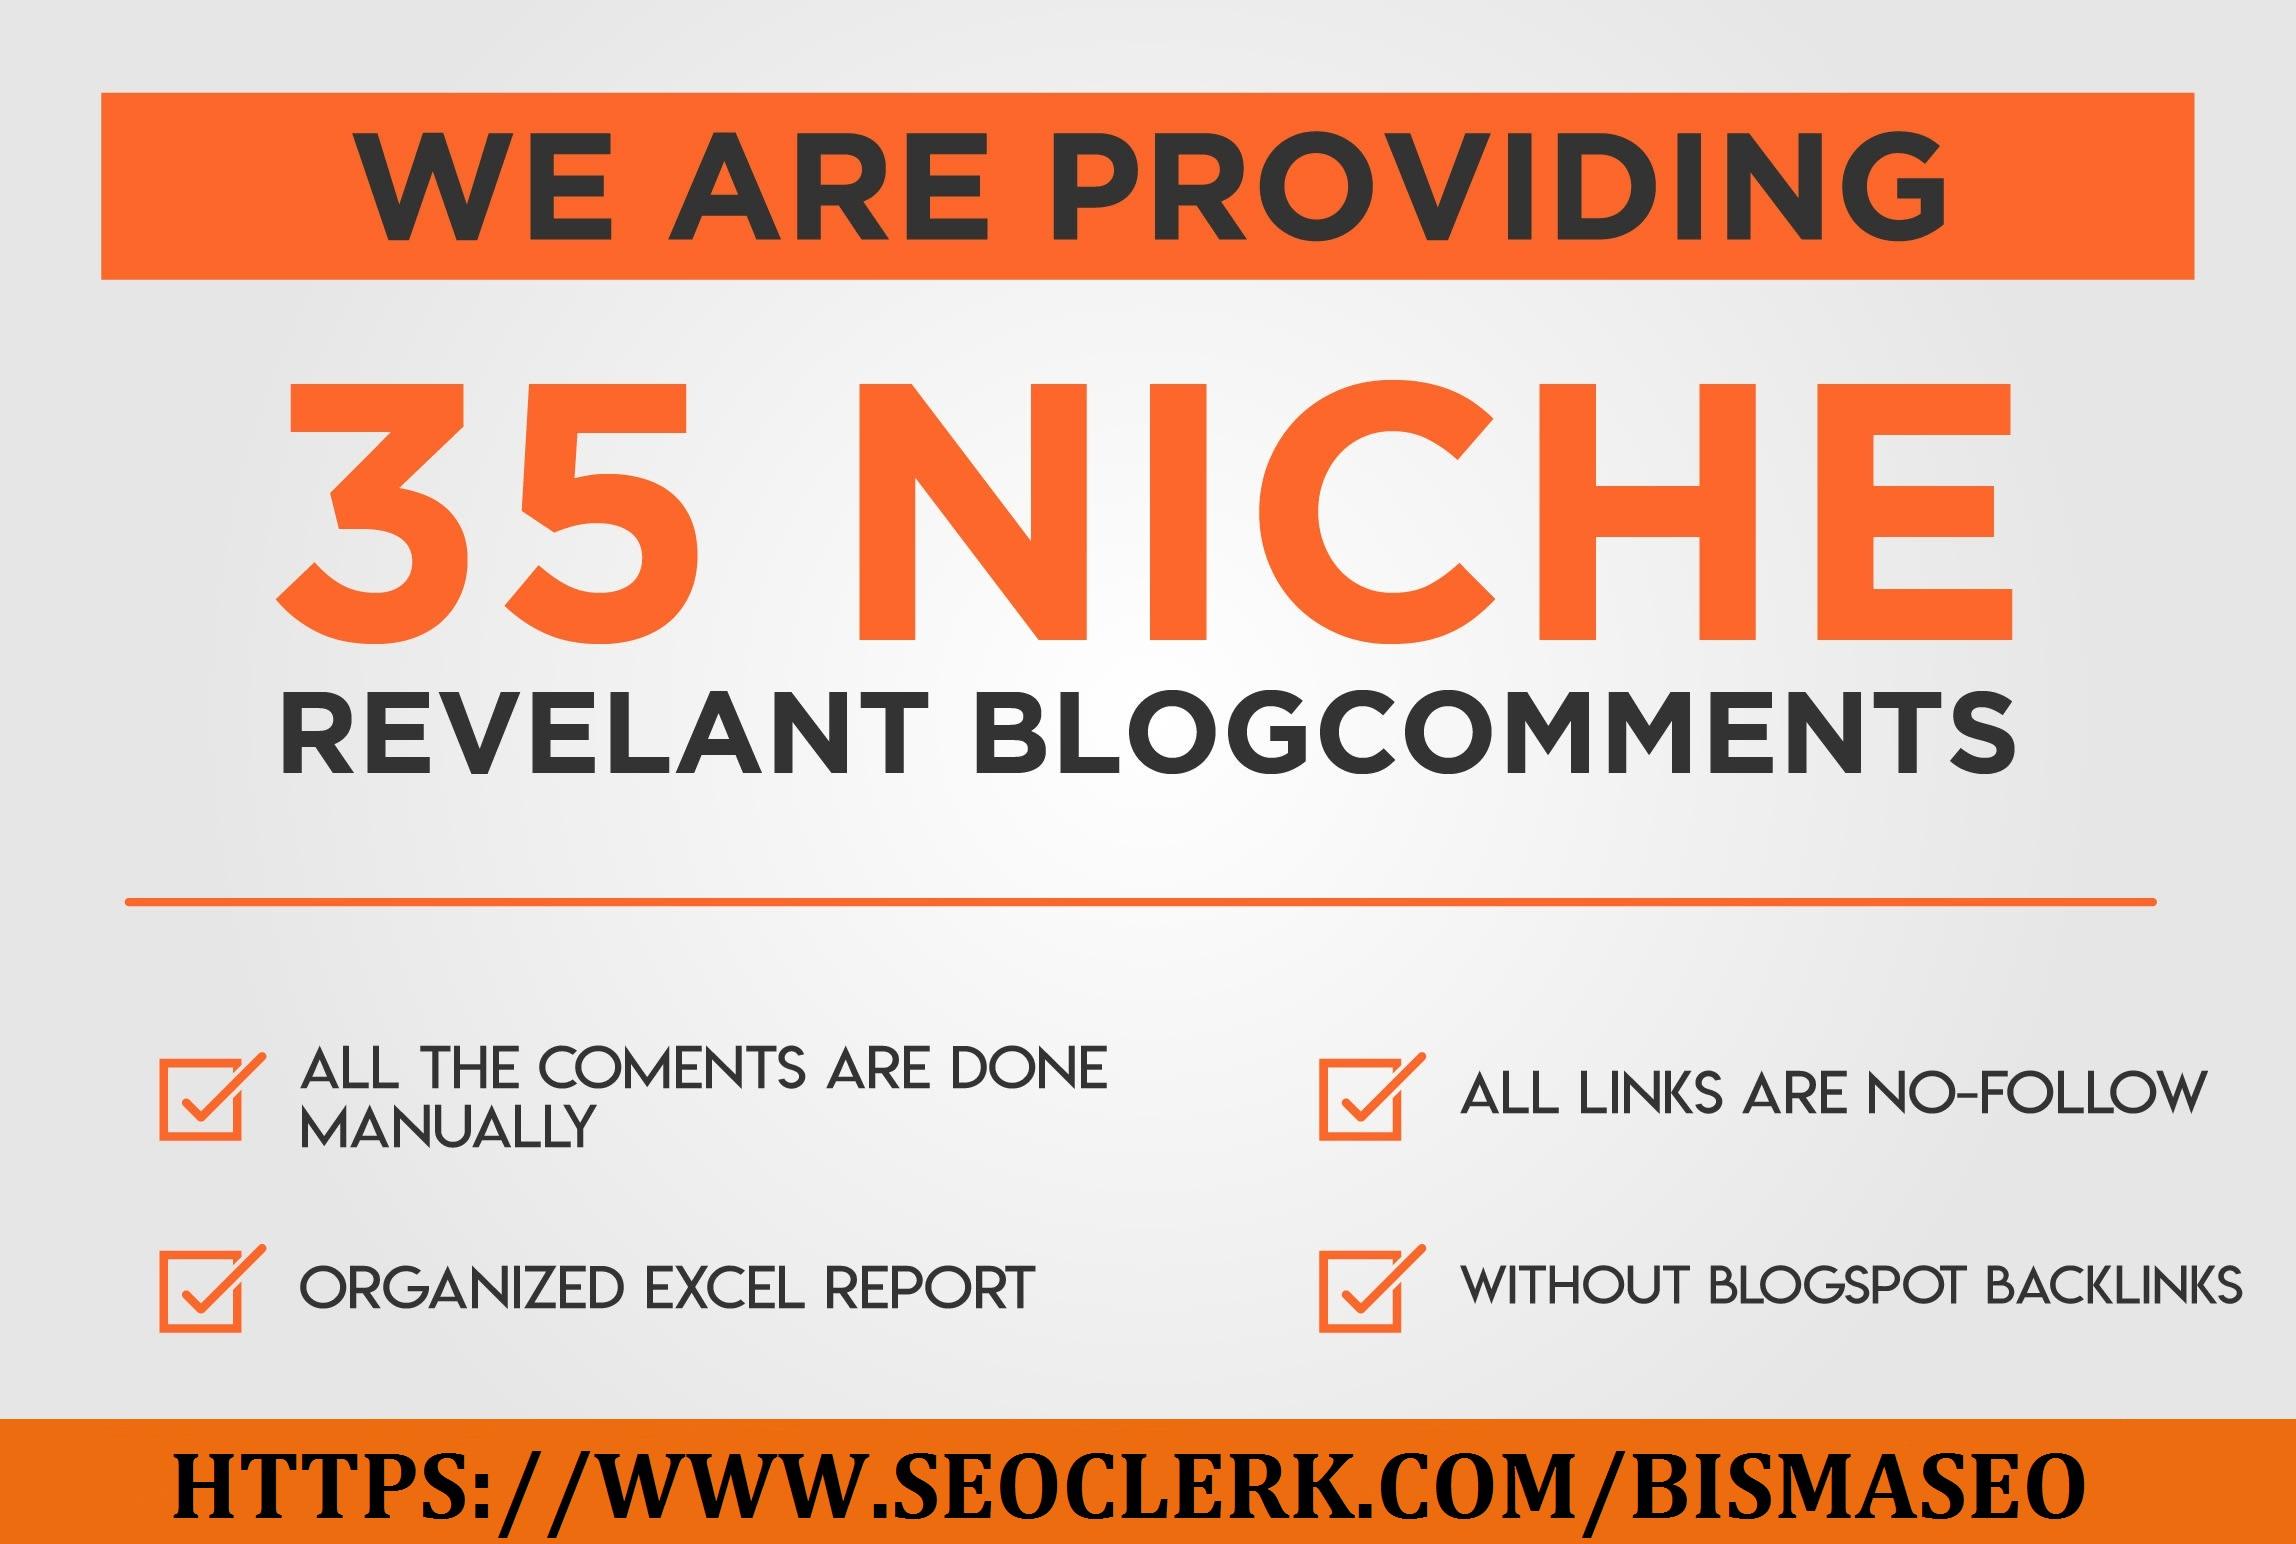 I will Provide 35 niche relevant nofollow backlinks